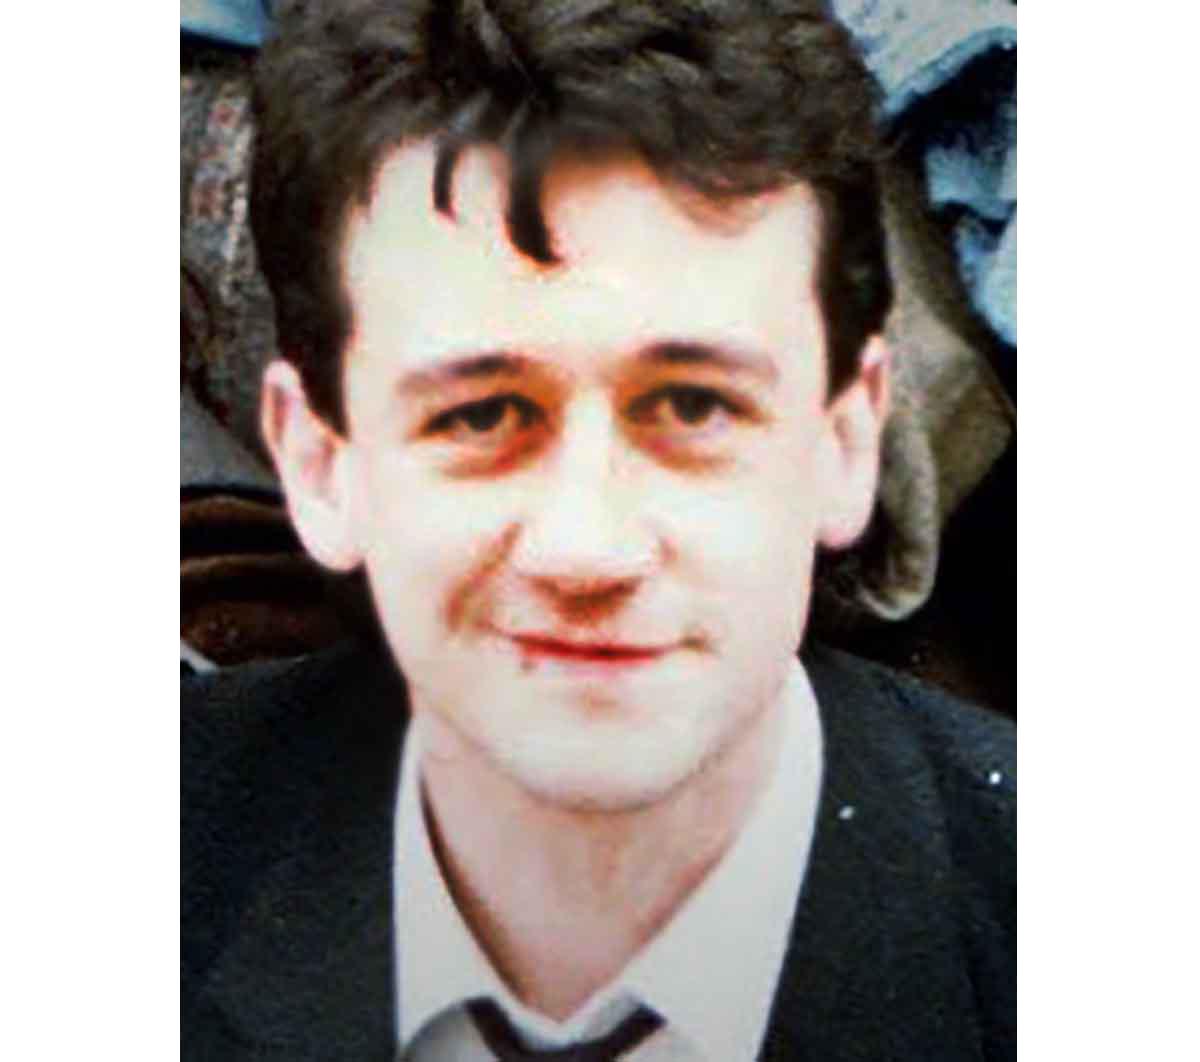 Allan Little as a young man